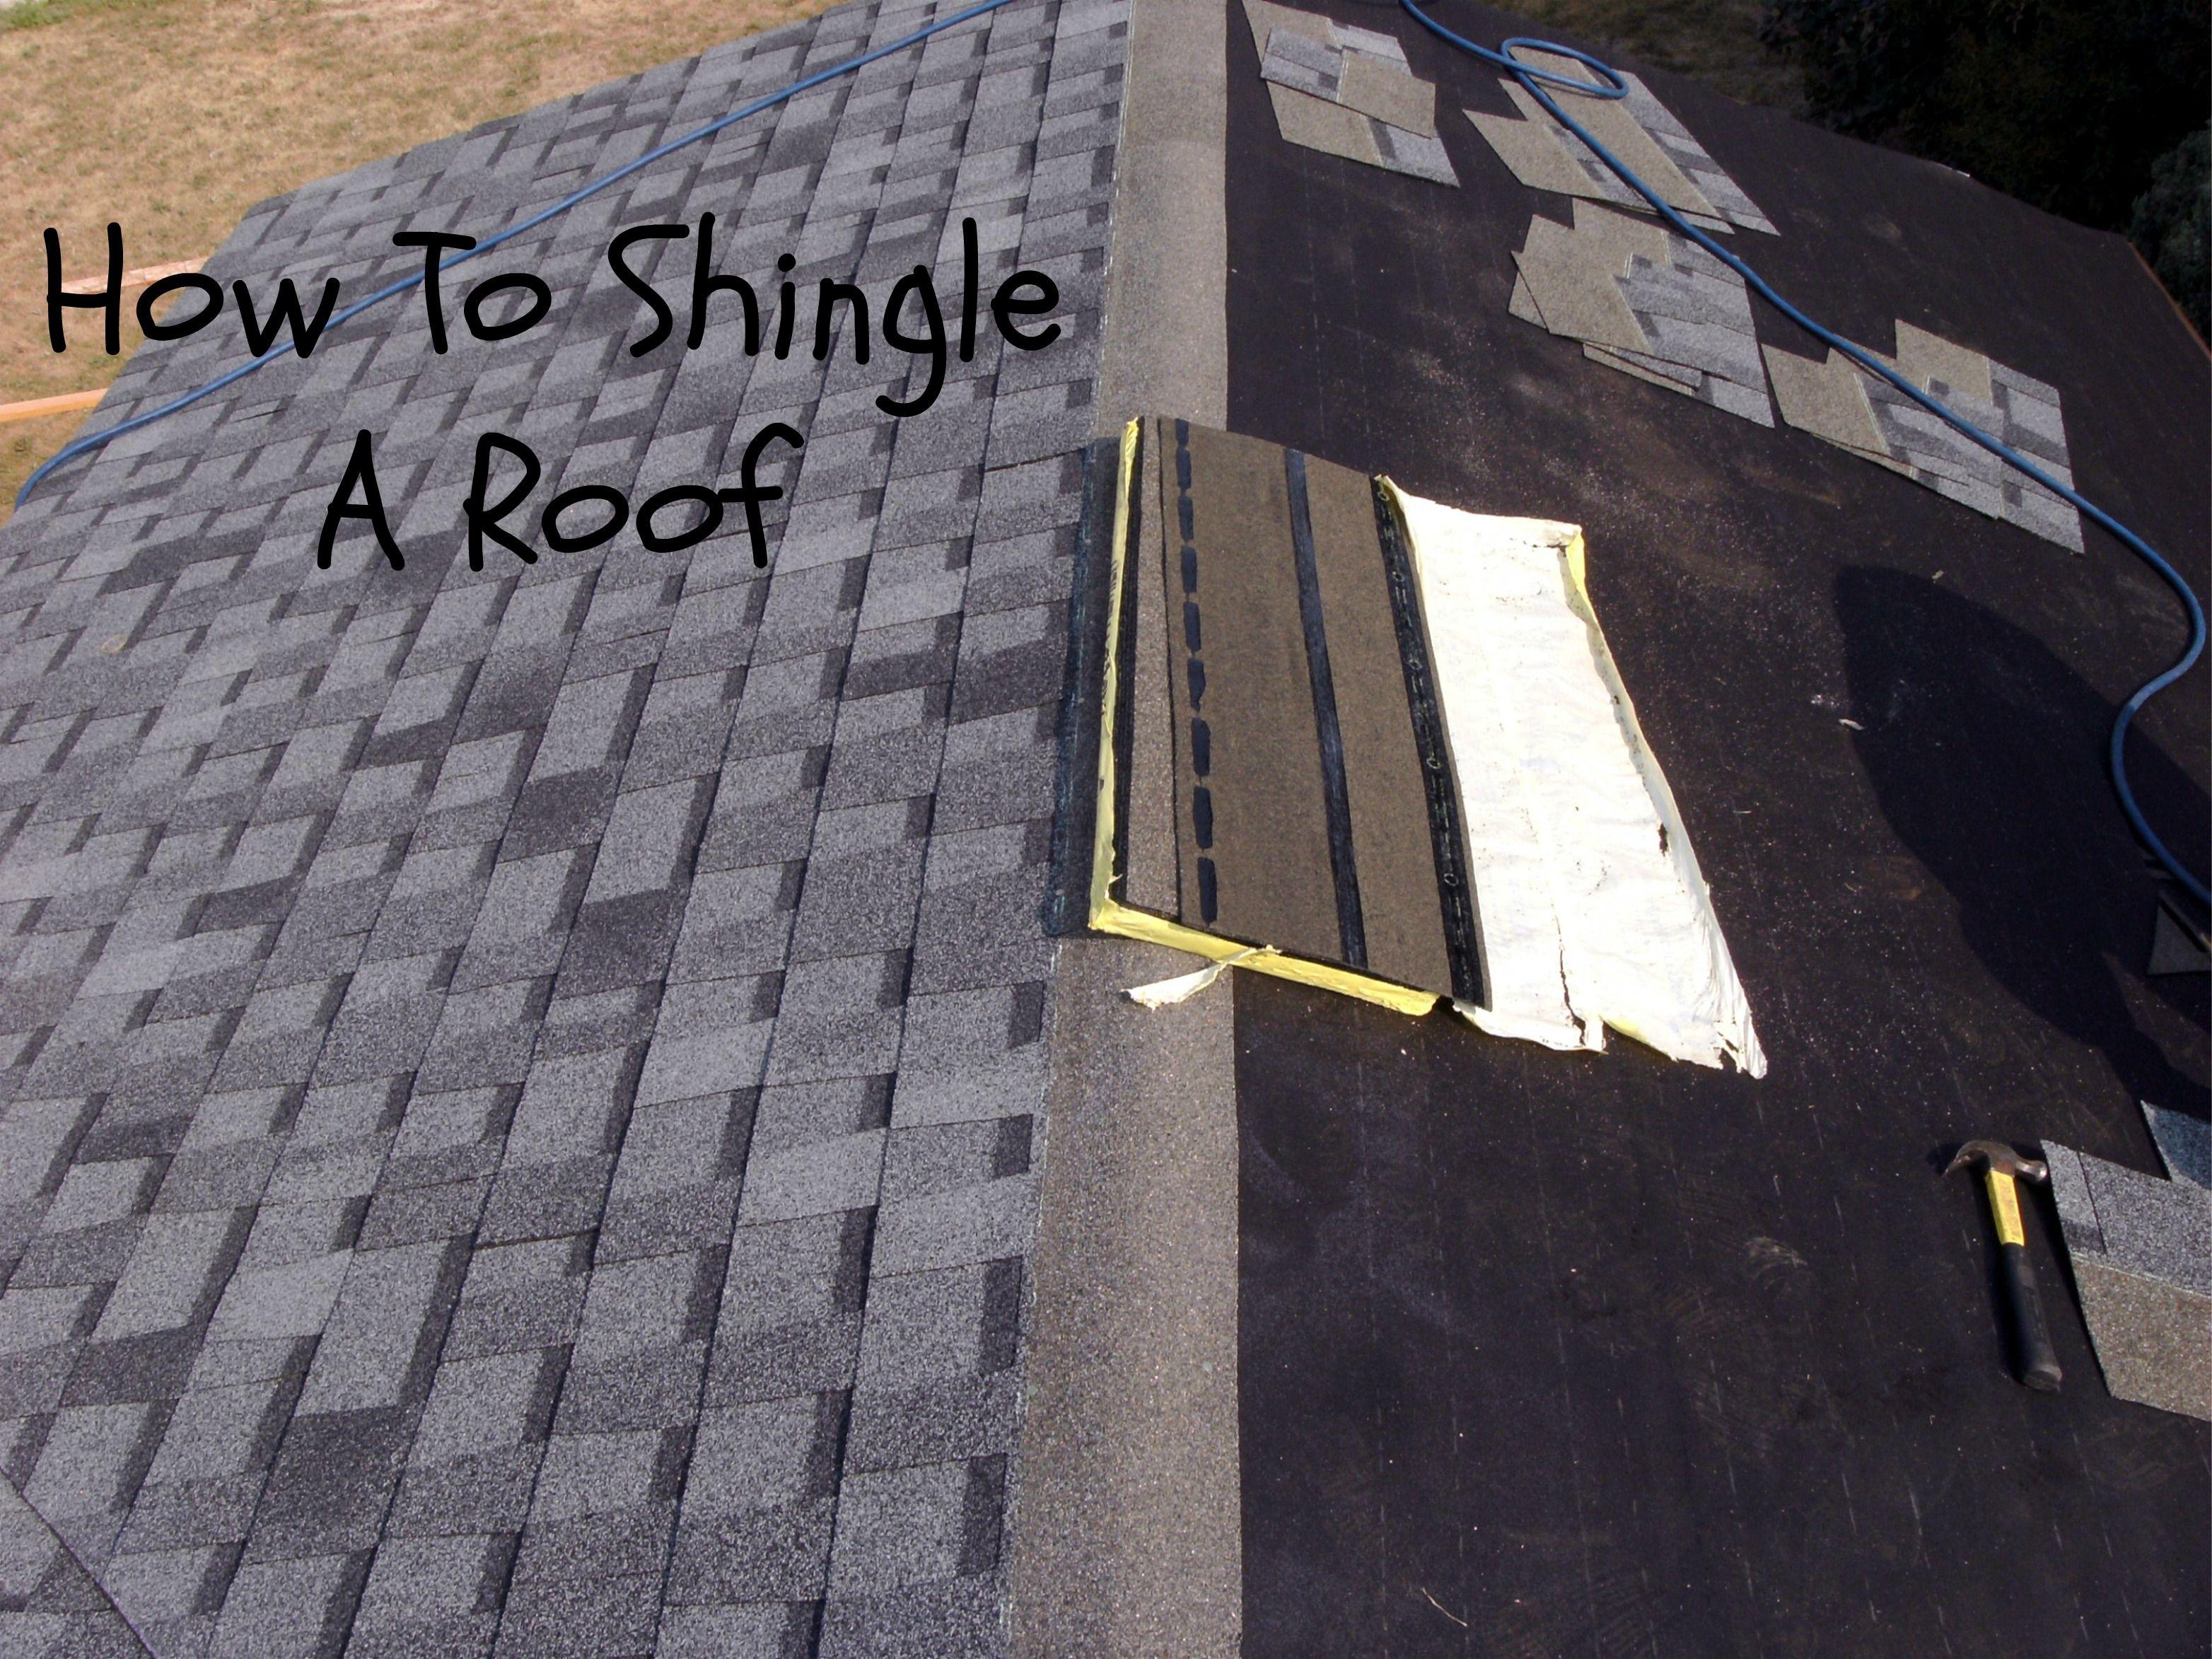 How To Shingle A Roof Laying Asphalt Shingles With Images Asphalt Shingles Shingling Roof Repair